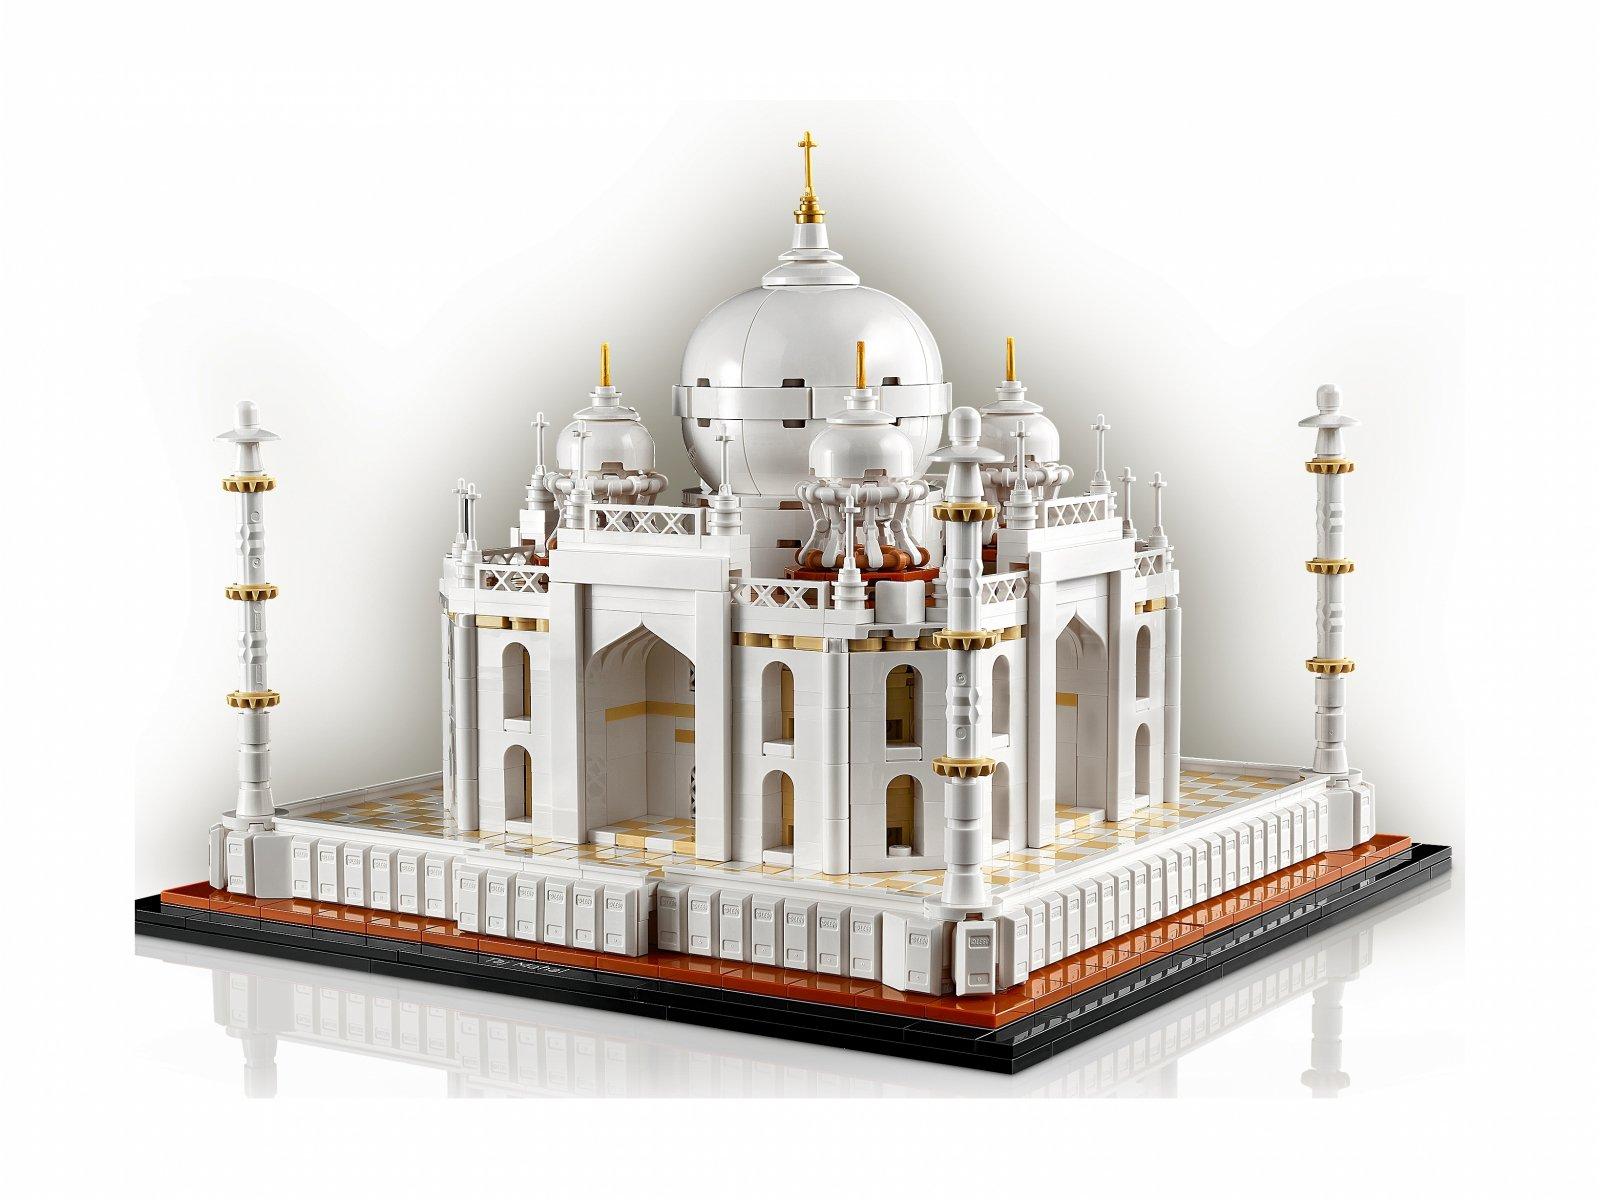 LEGO 21056 Architecture Tadż Mahal